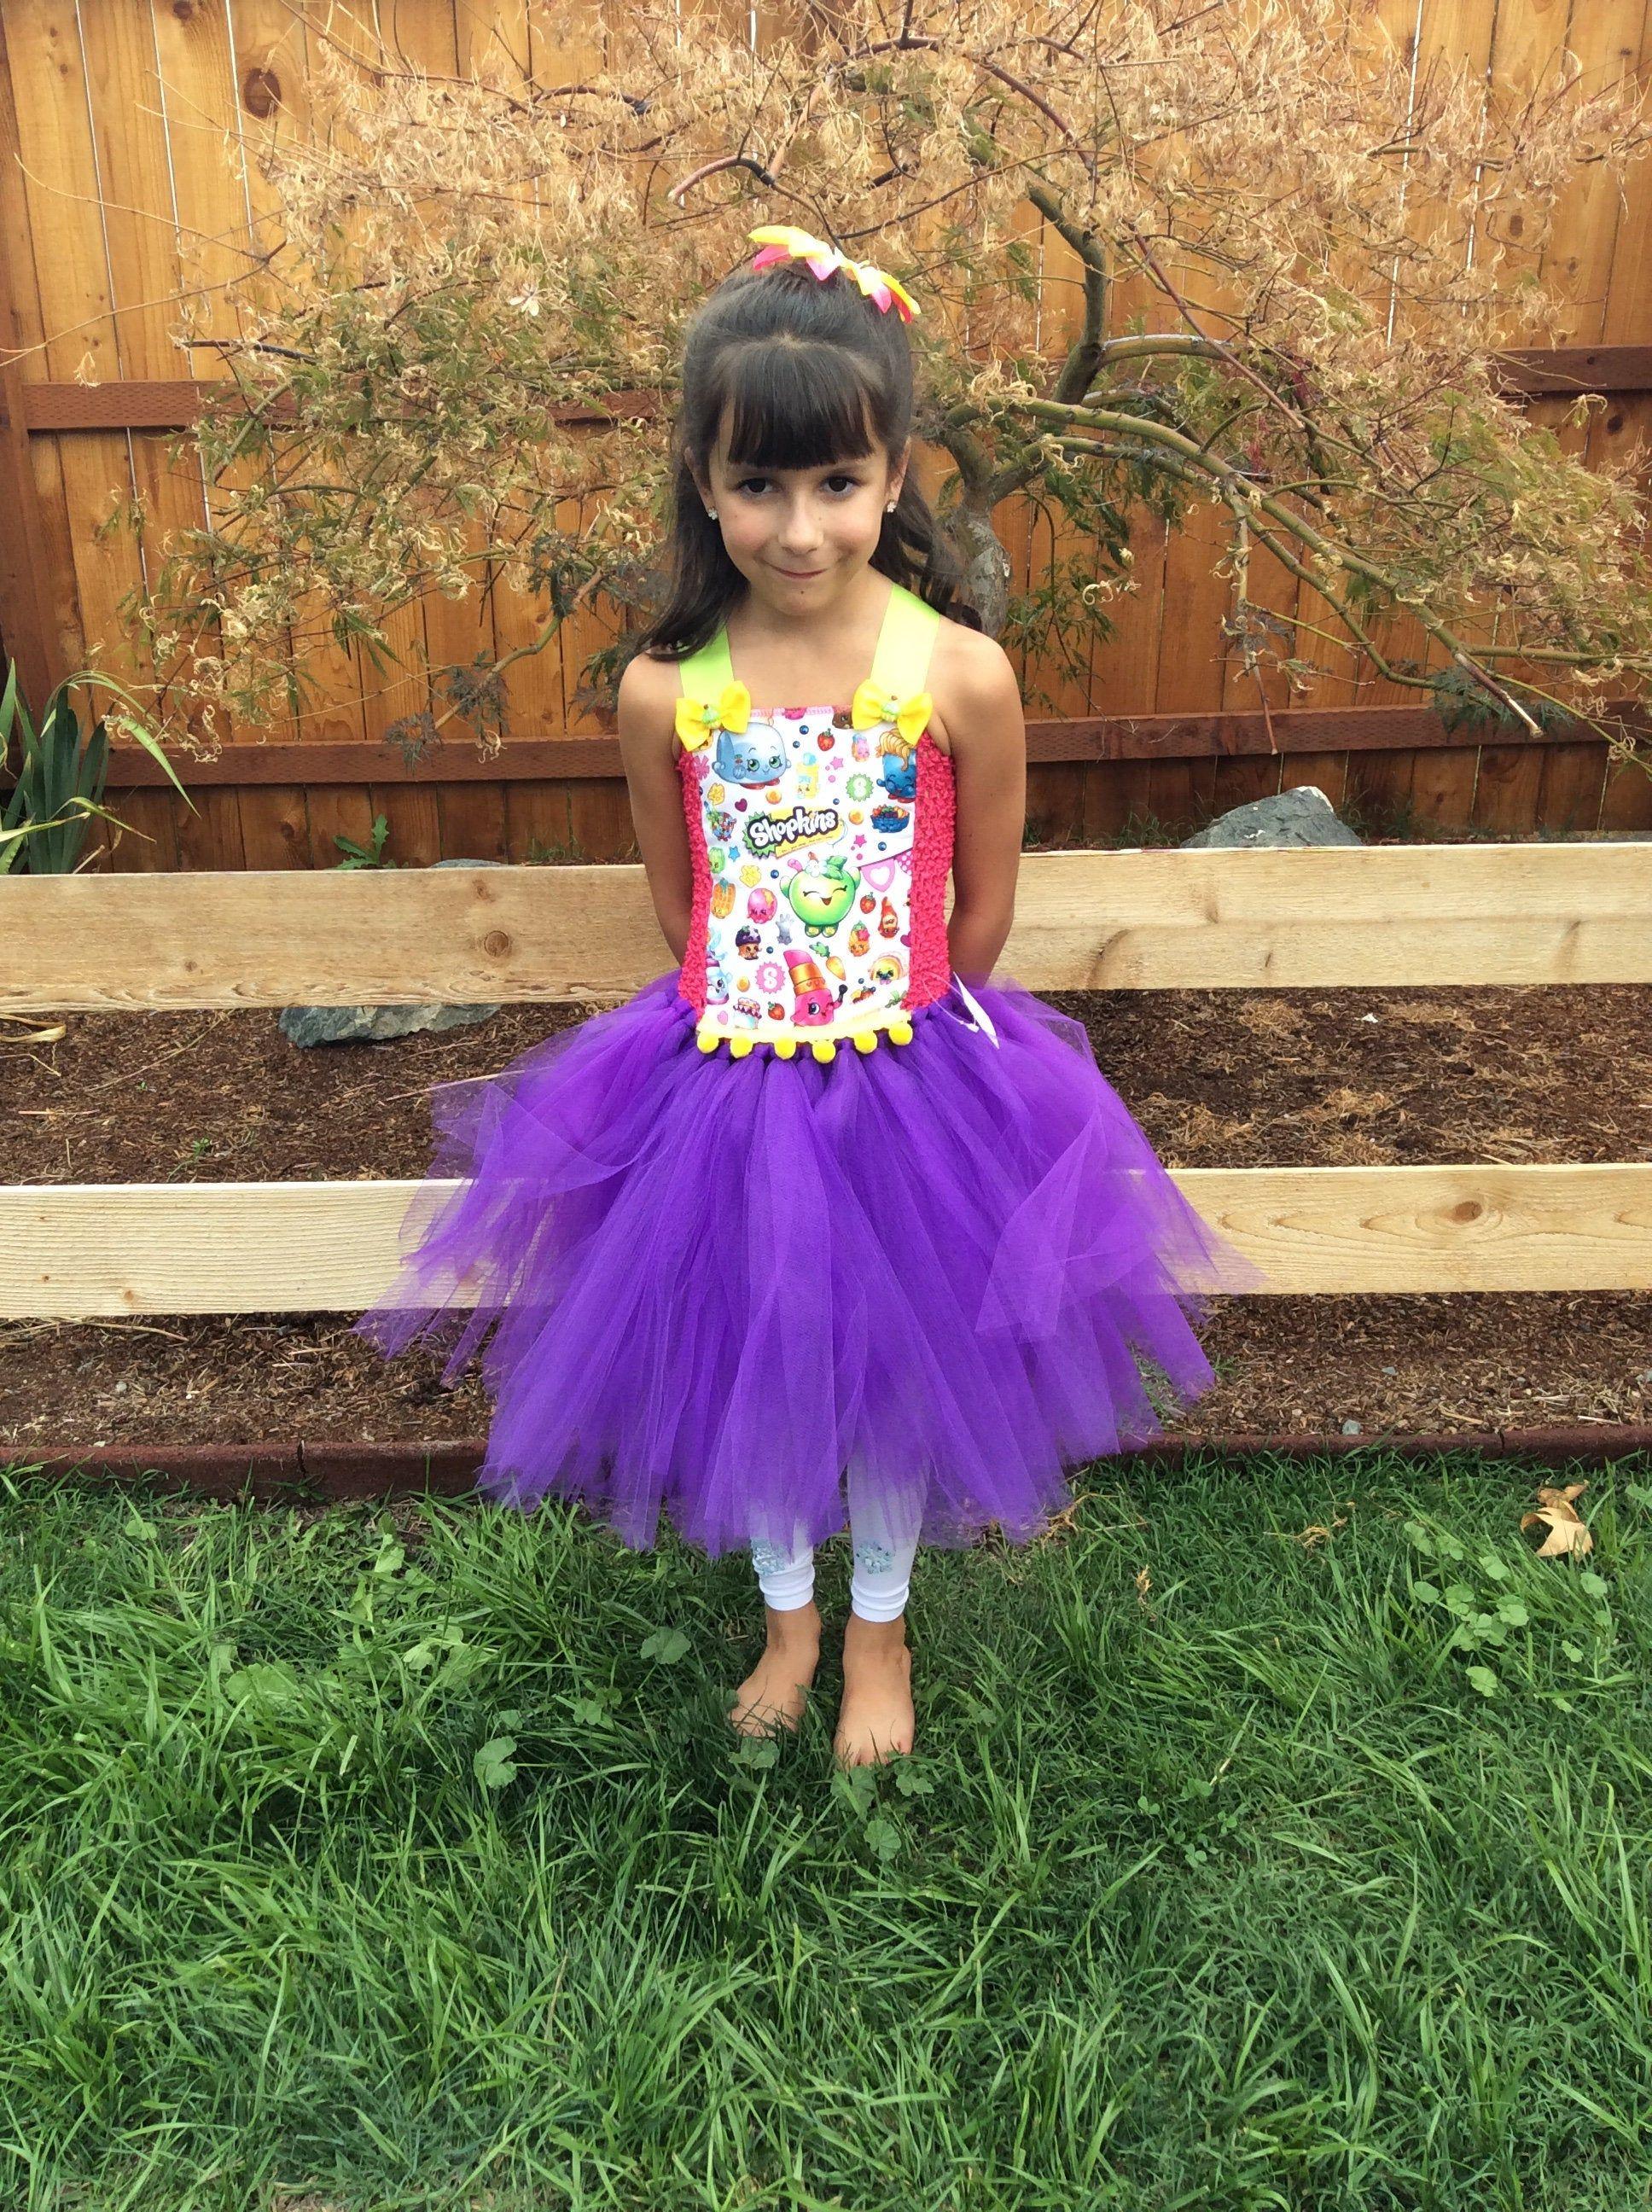 This Item Is Unavailable Etsy Purple Tutu Dress Purple Tutu Girls Dance Costumes [ 2592 x 1936 Pixel ]